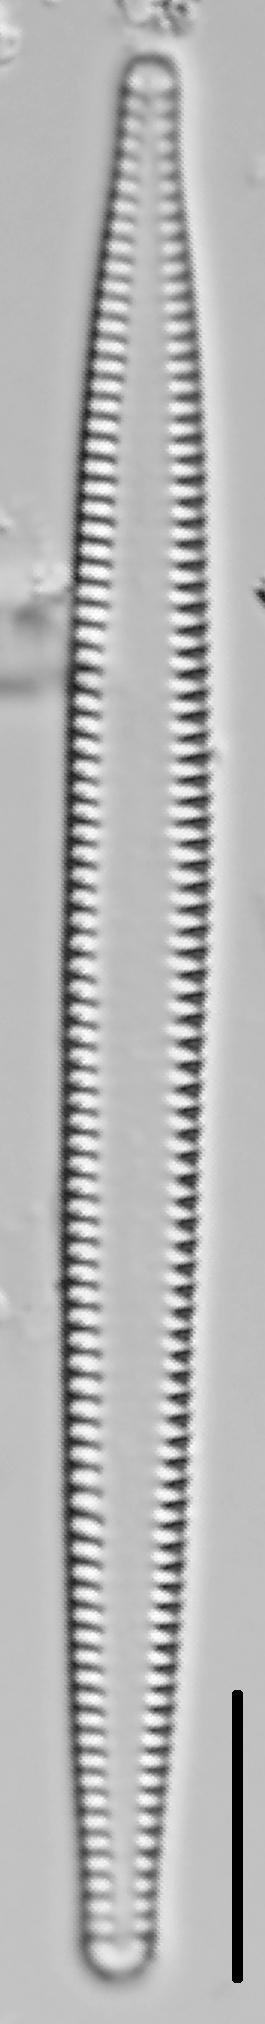 Tabularia fasciculata LM1